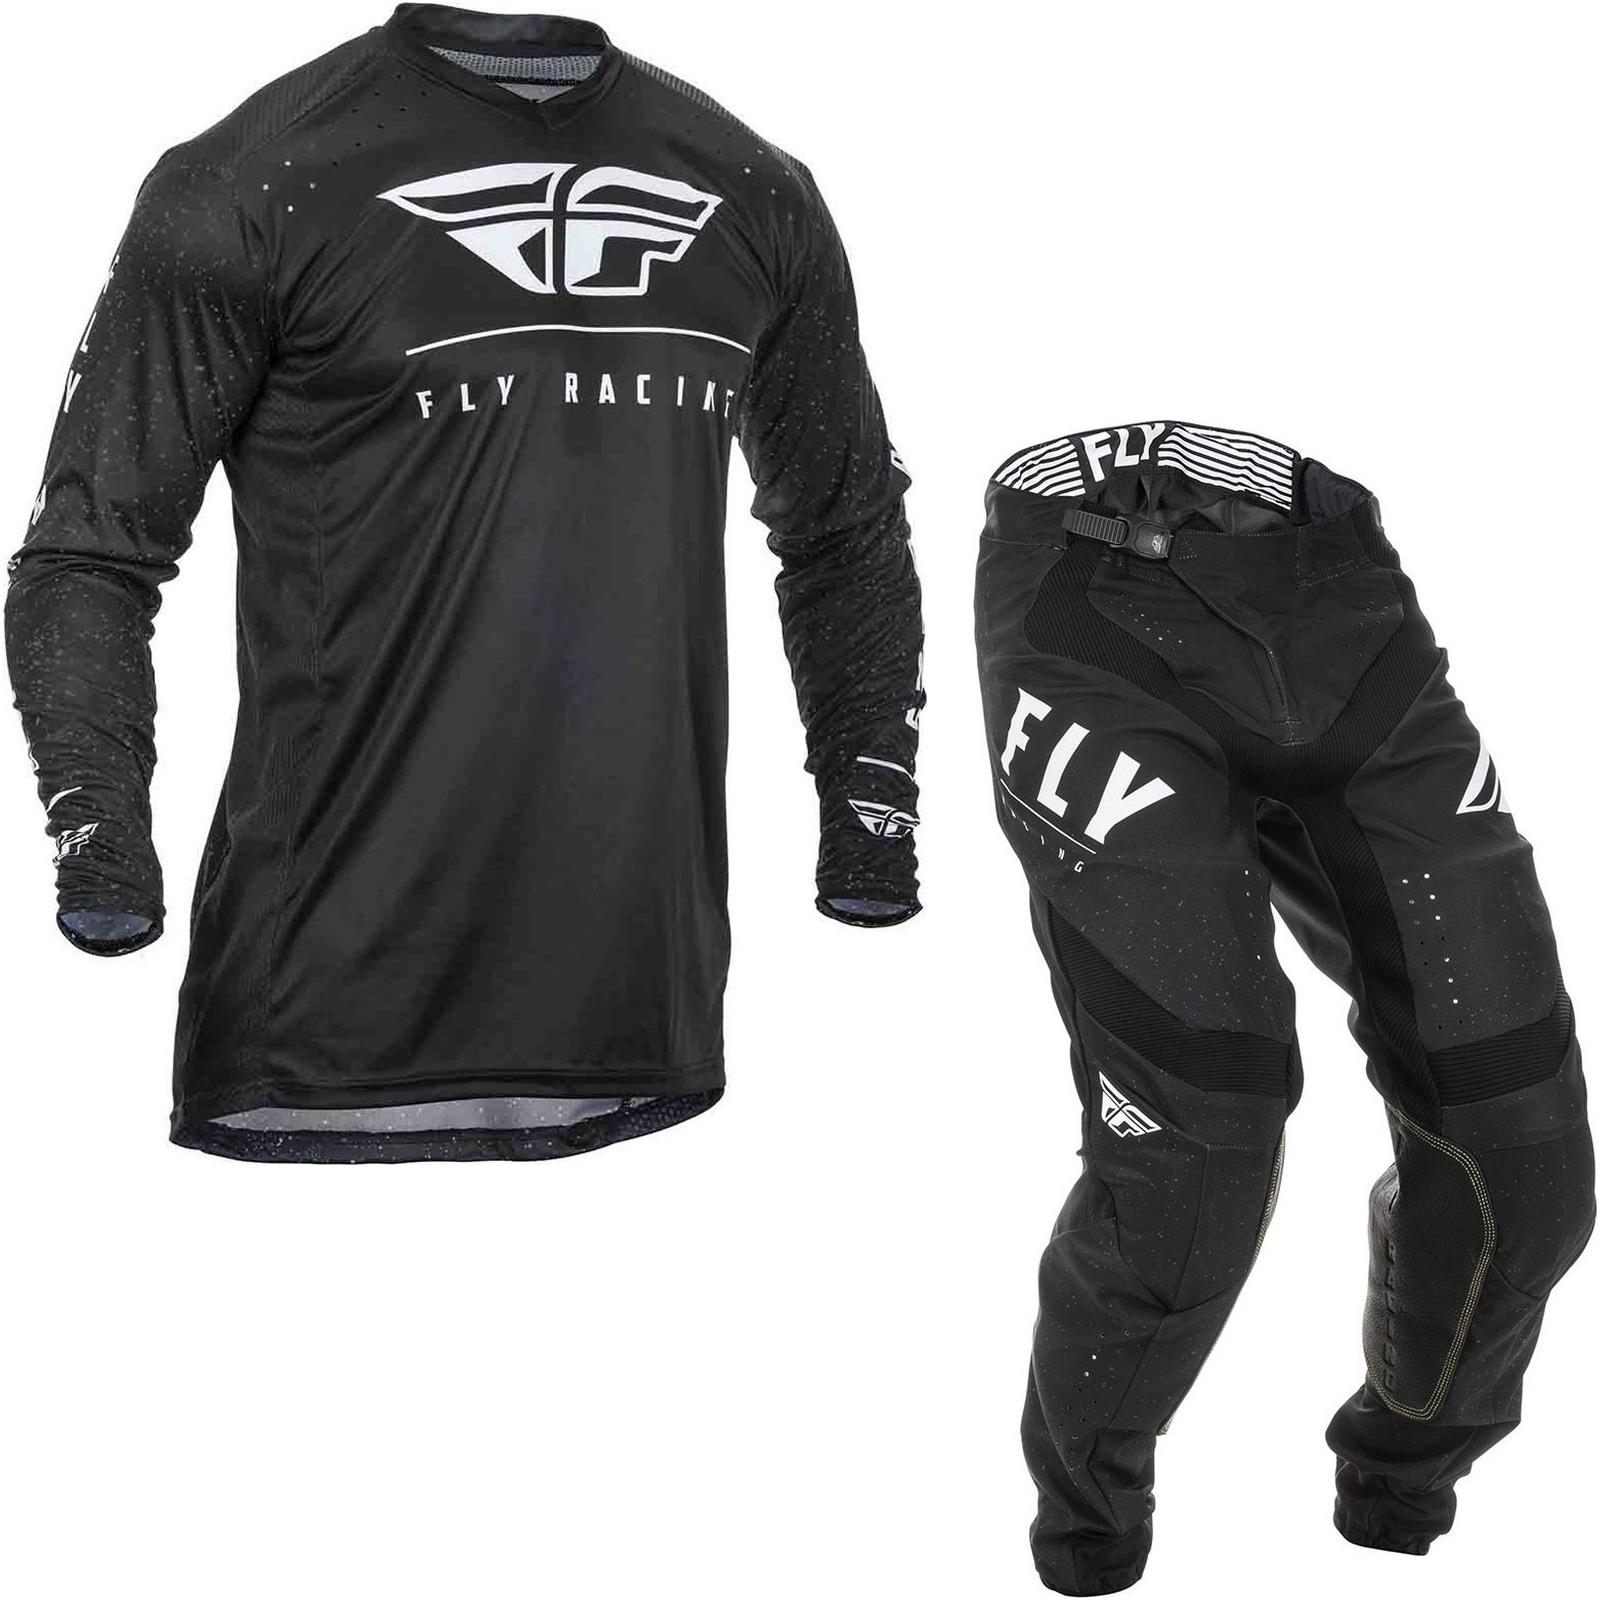 Fly Racing Lite Hydrogen Jersey Pant Combo Set MX Riding Gear MX//ATV Motocross